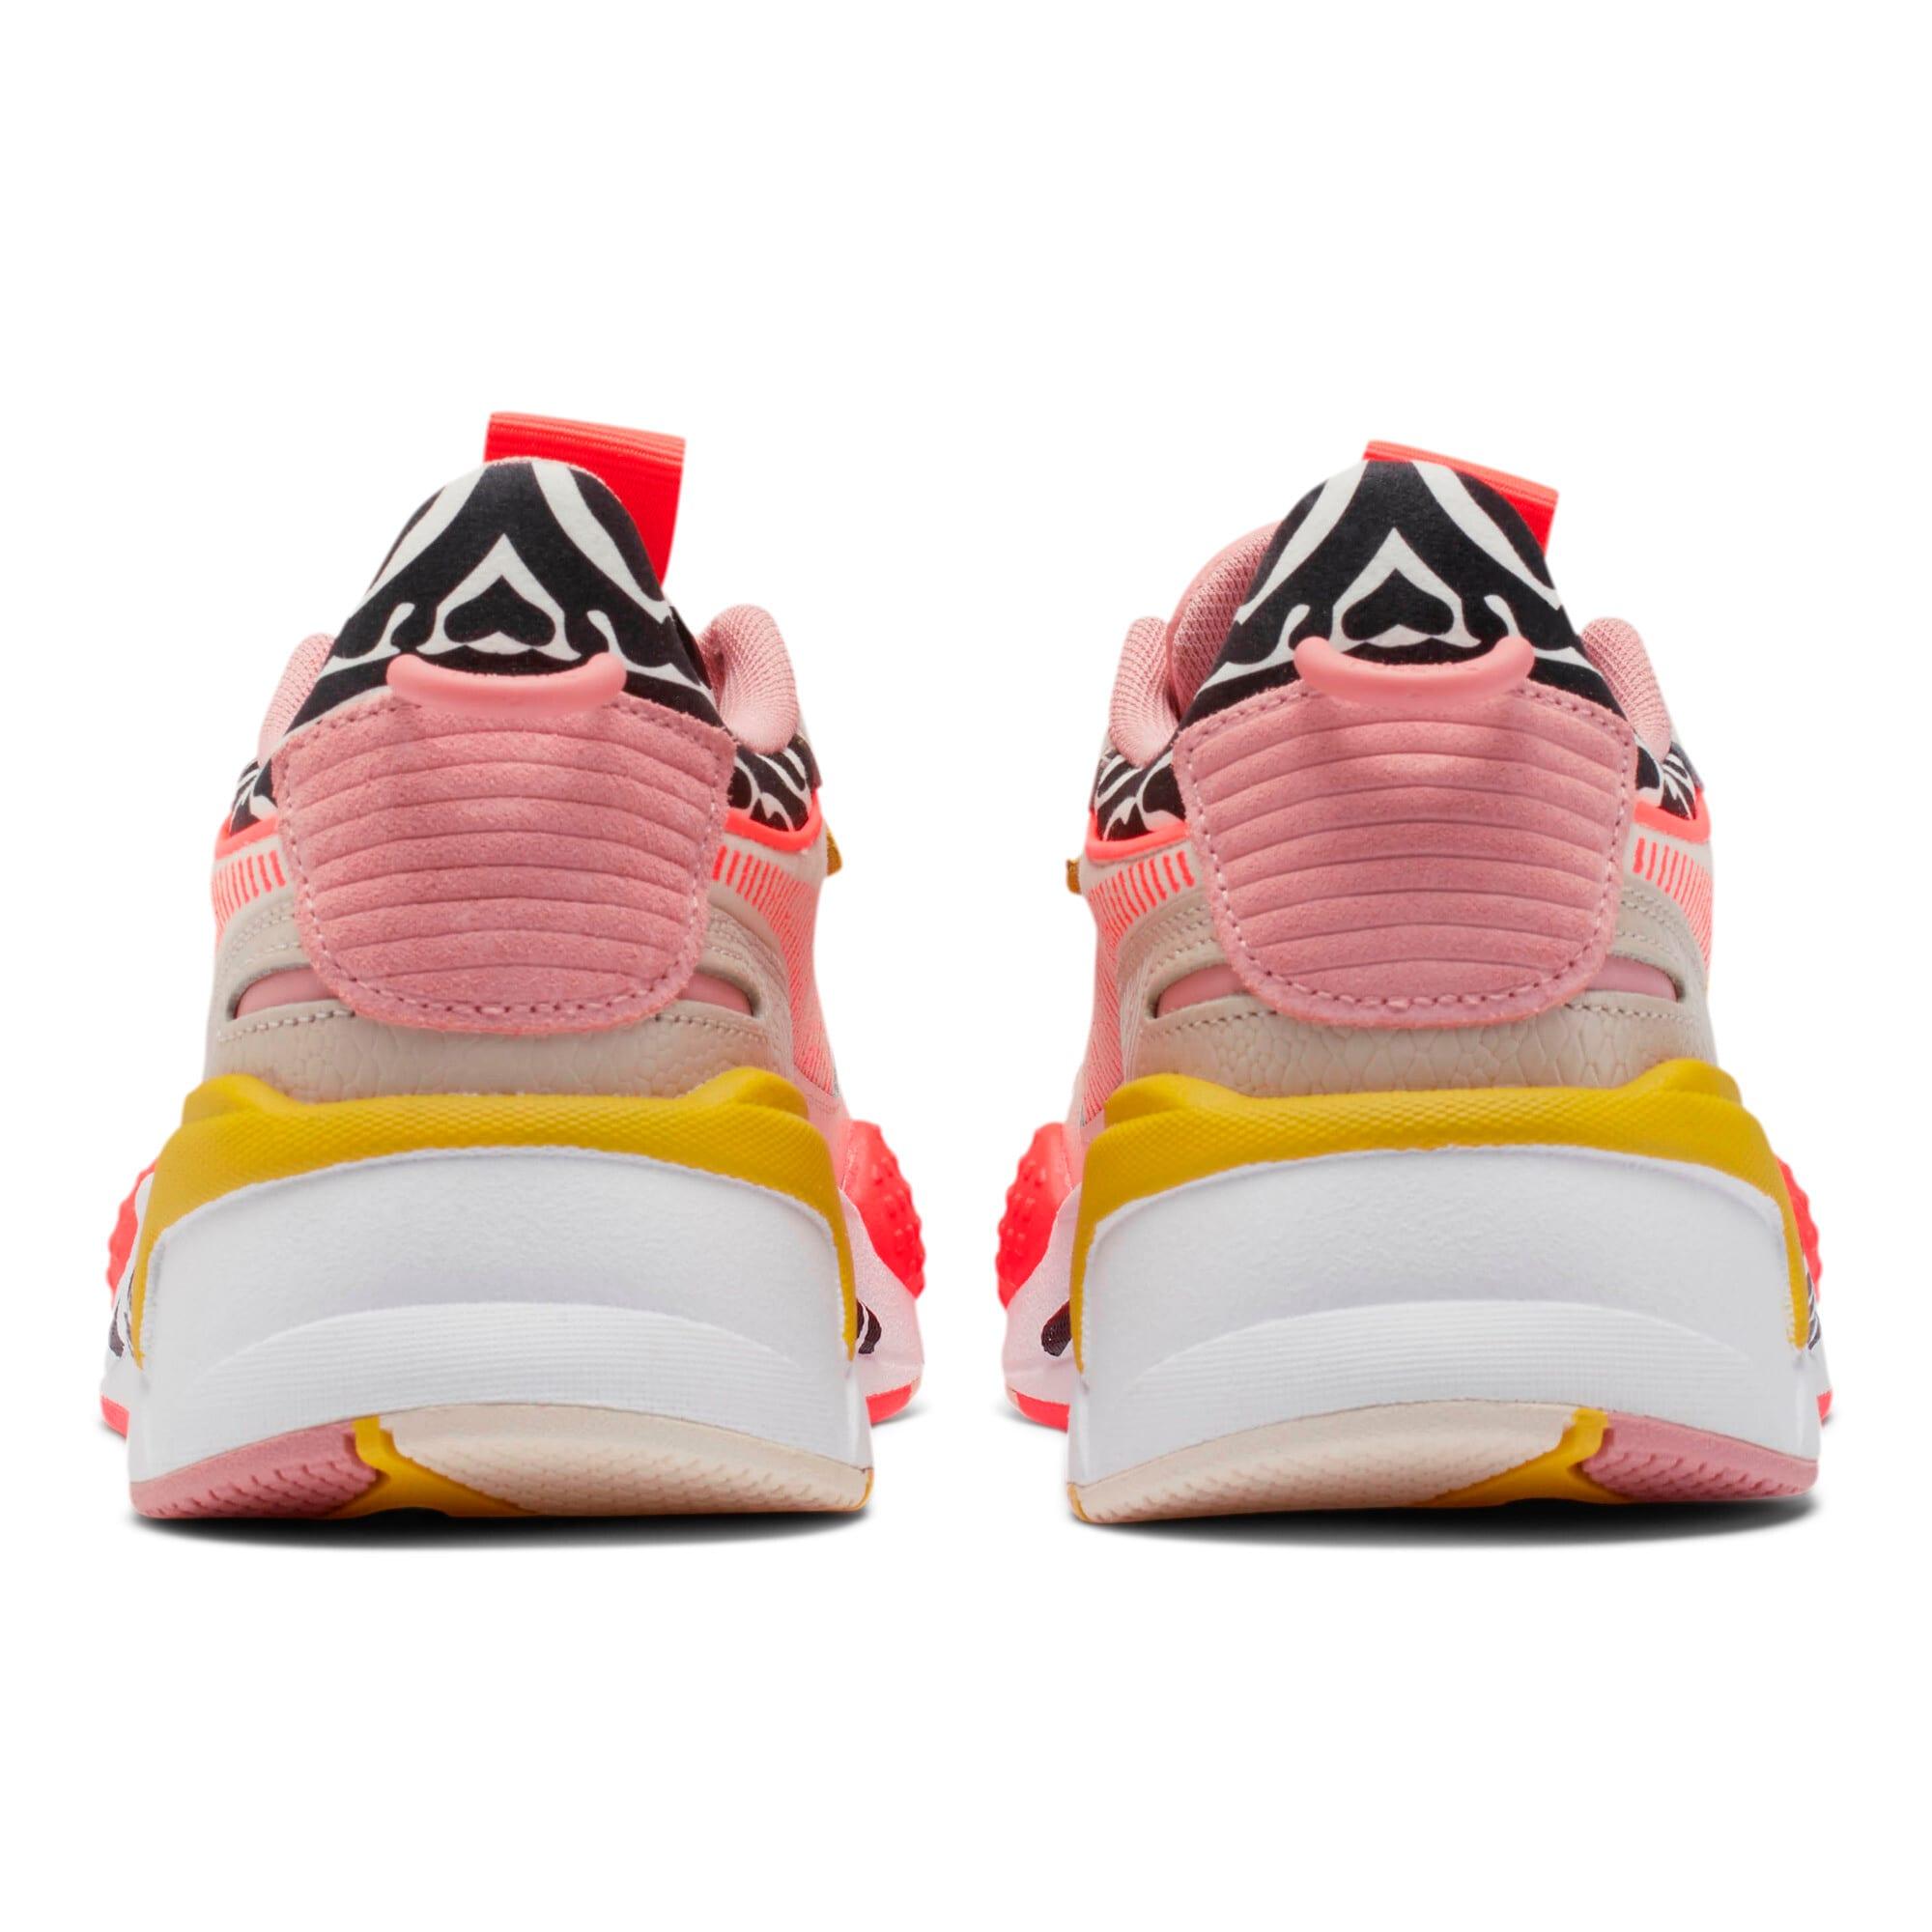 Thumbnail 3 of RS-X Unexpected Mixes Women's Sneakers, Pastel-Bridal Rose-Sulphur, medium